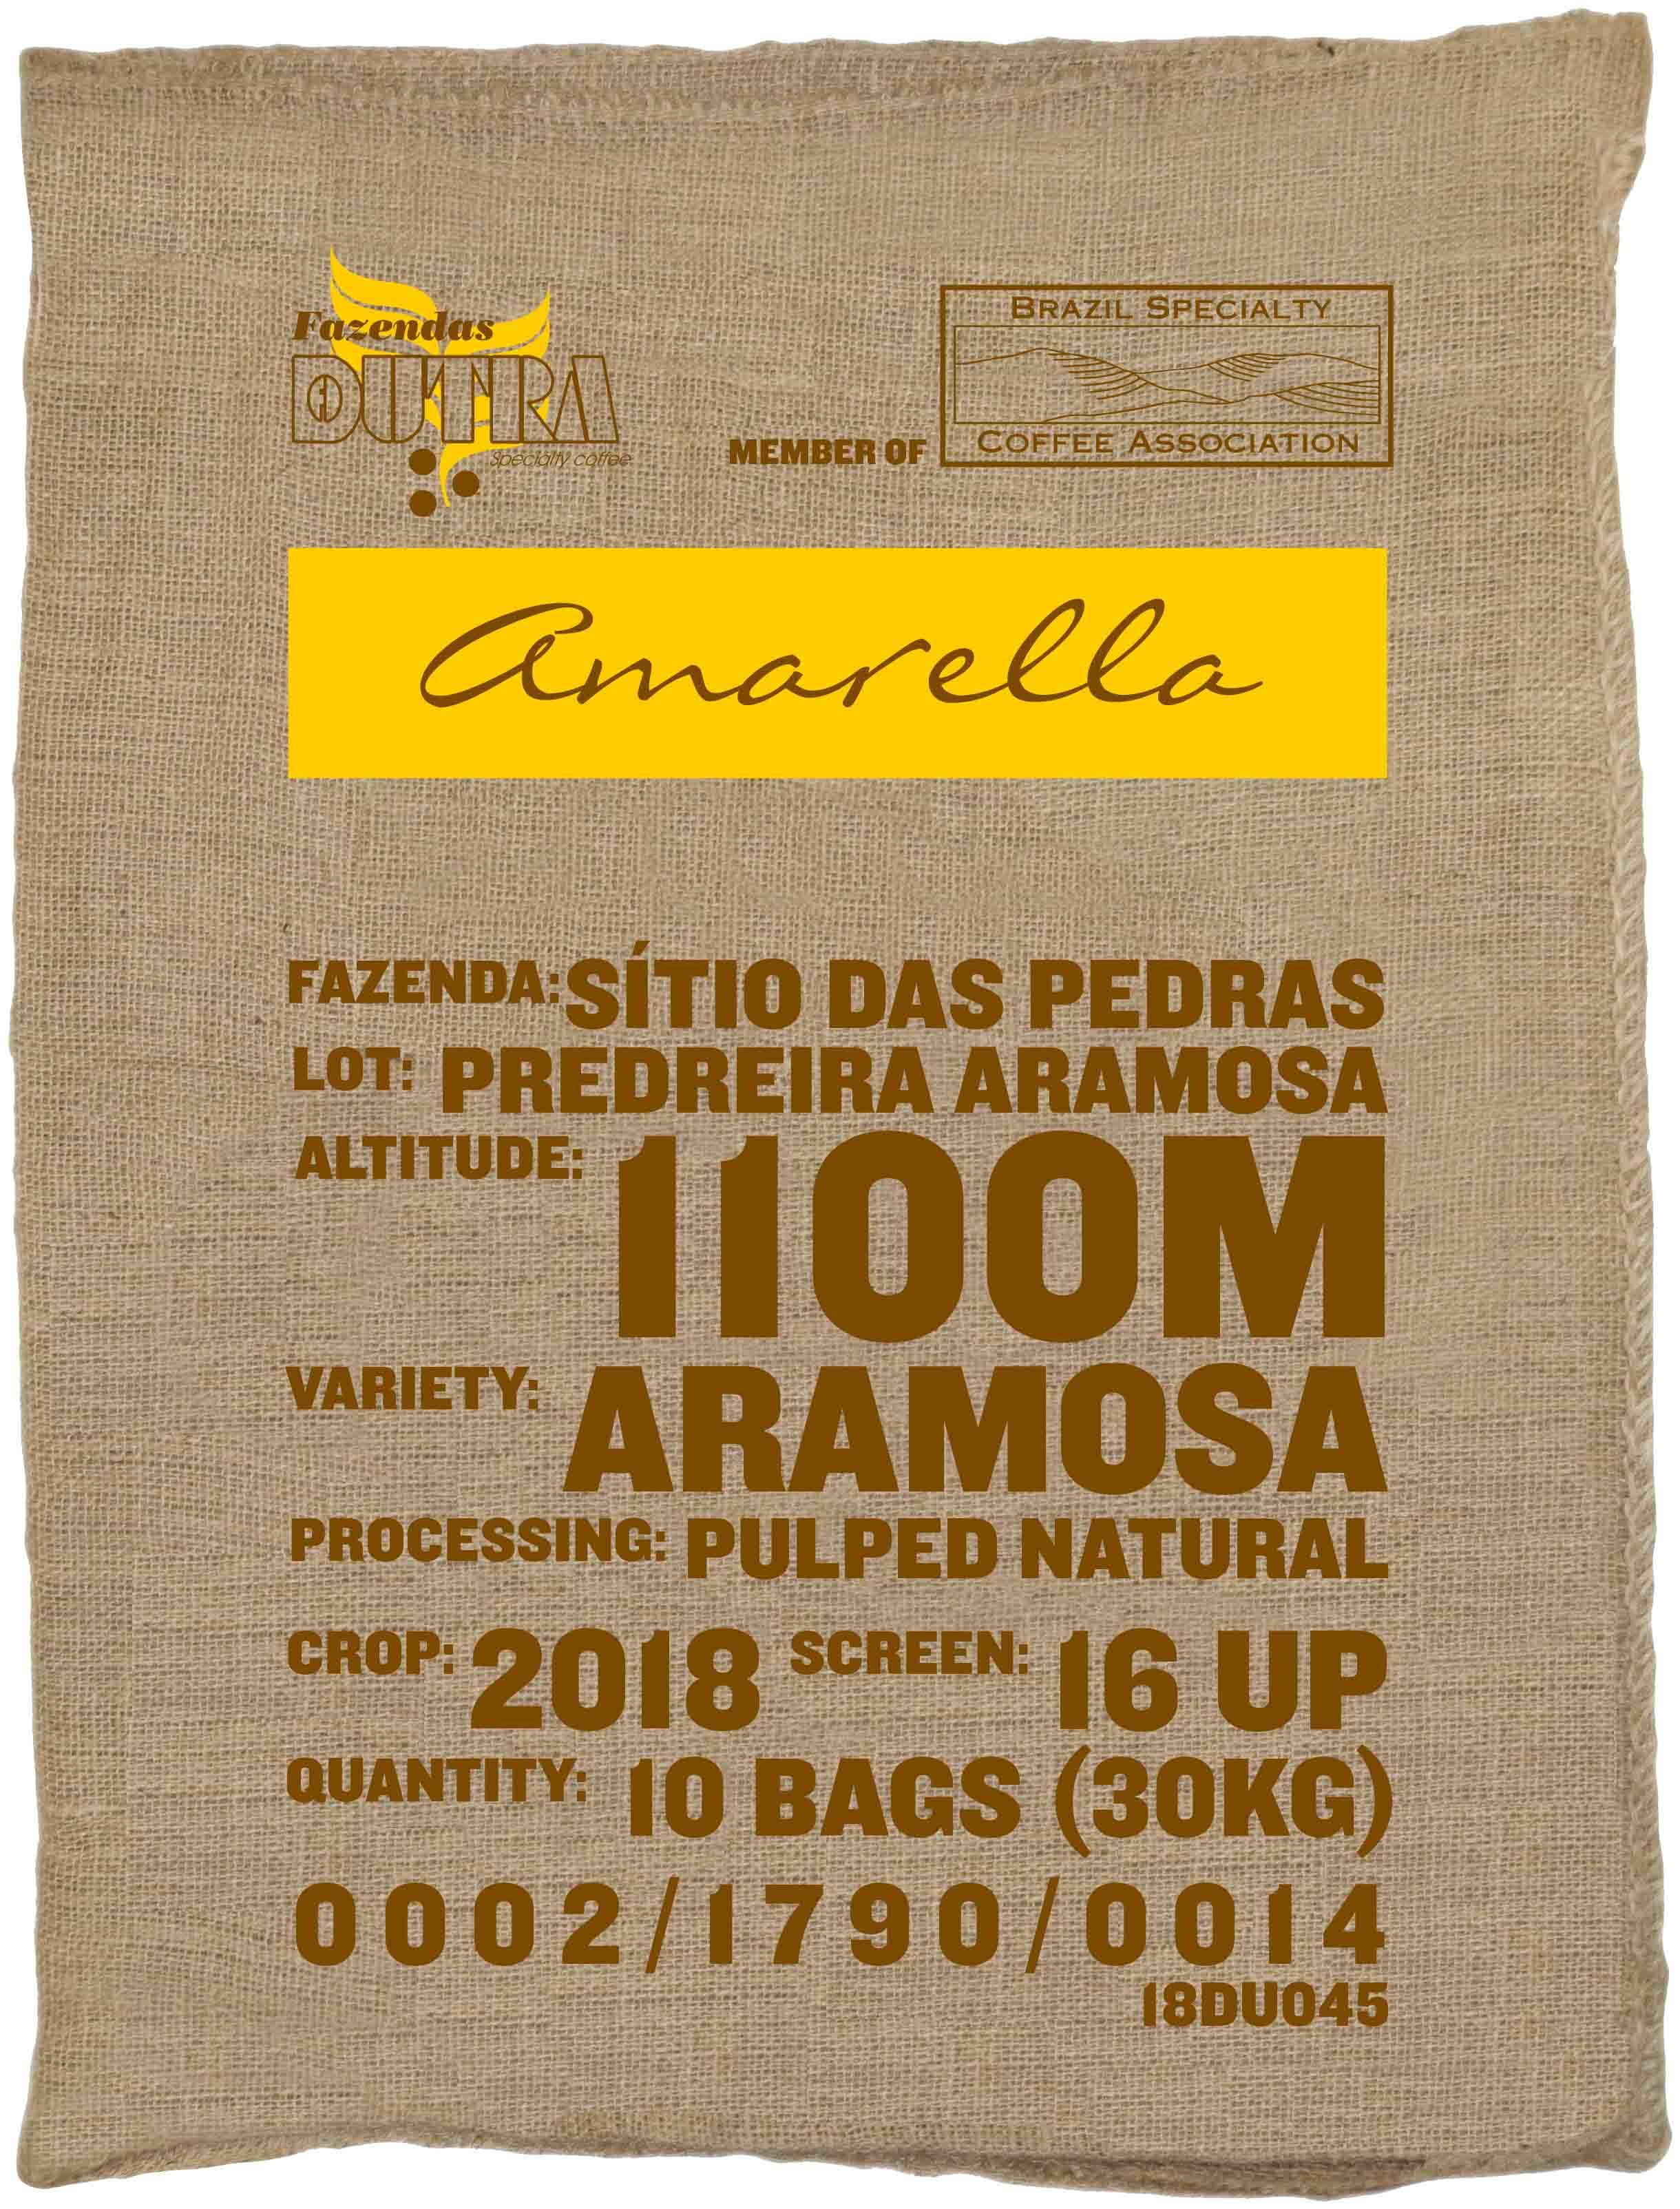 Ein Rohkaffeesack amarella Parzellenkaffee Varietät Aramosa. Fazendas Dutra Lot Predreira Aramosa.